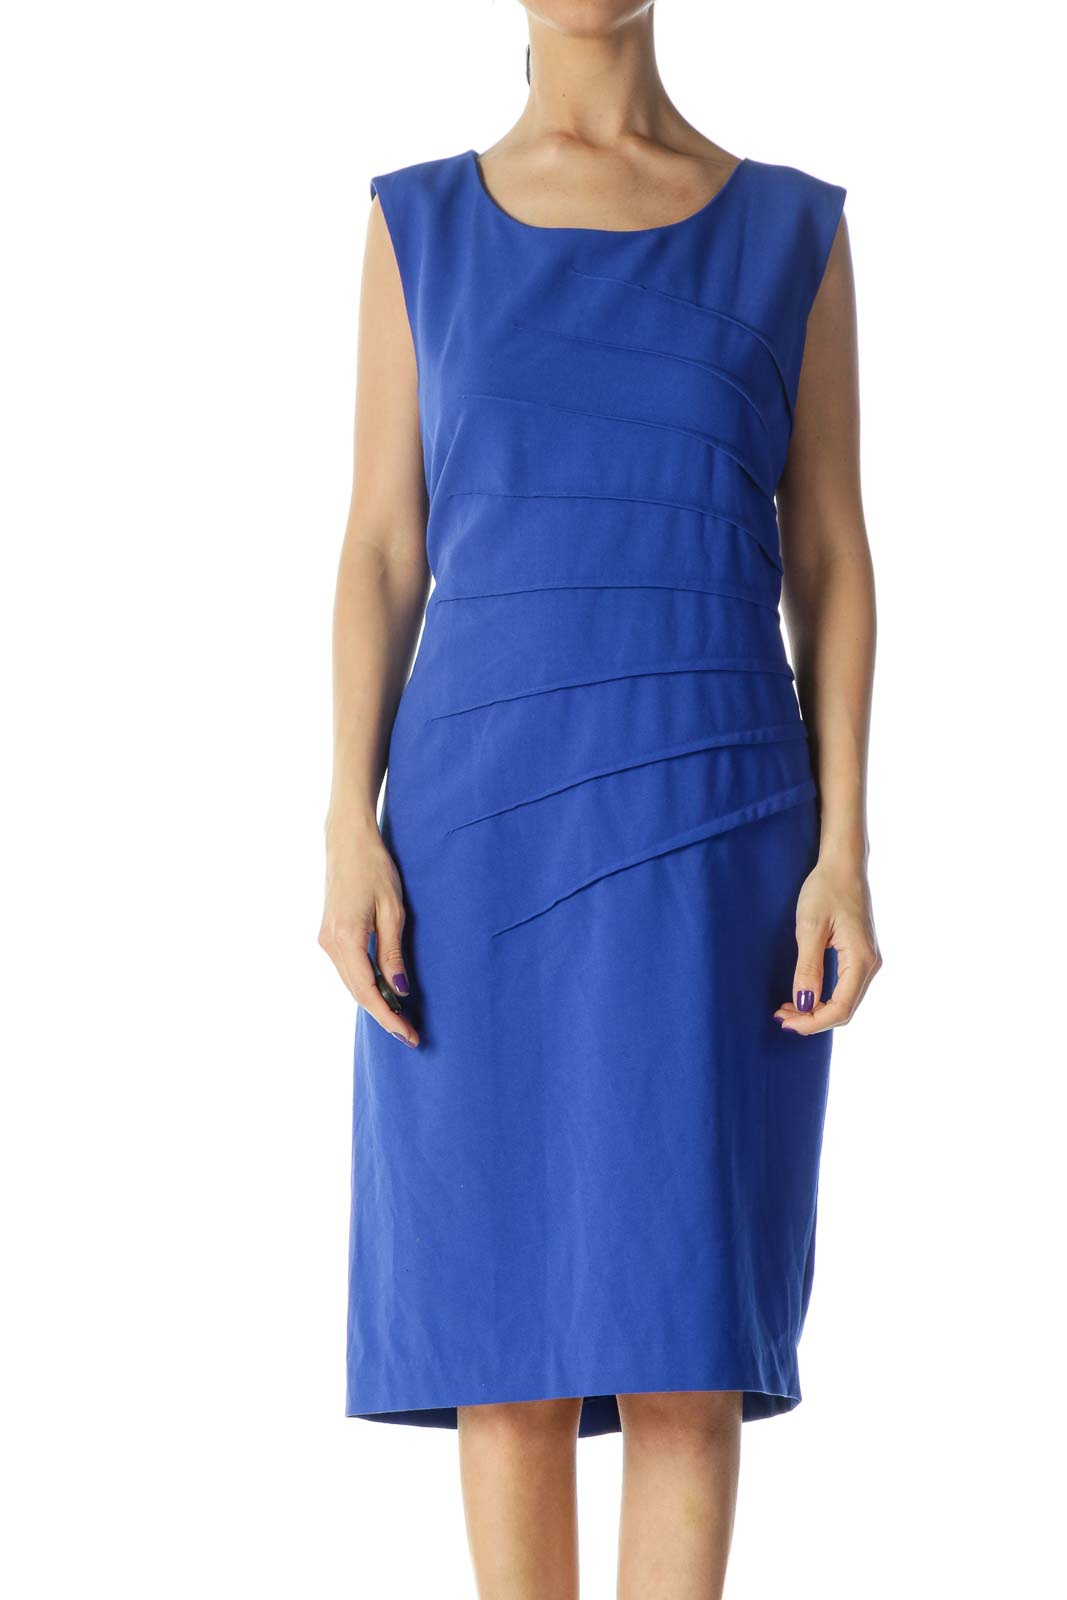 Blue Sheath Work Dress Front